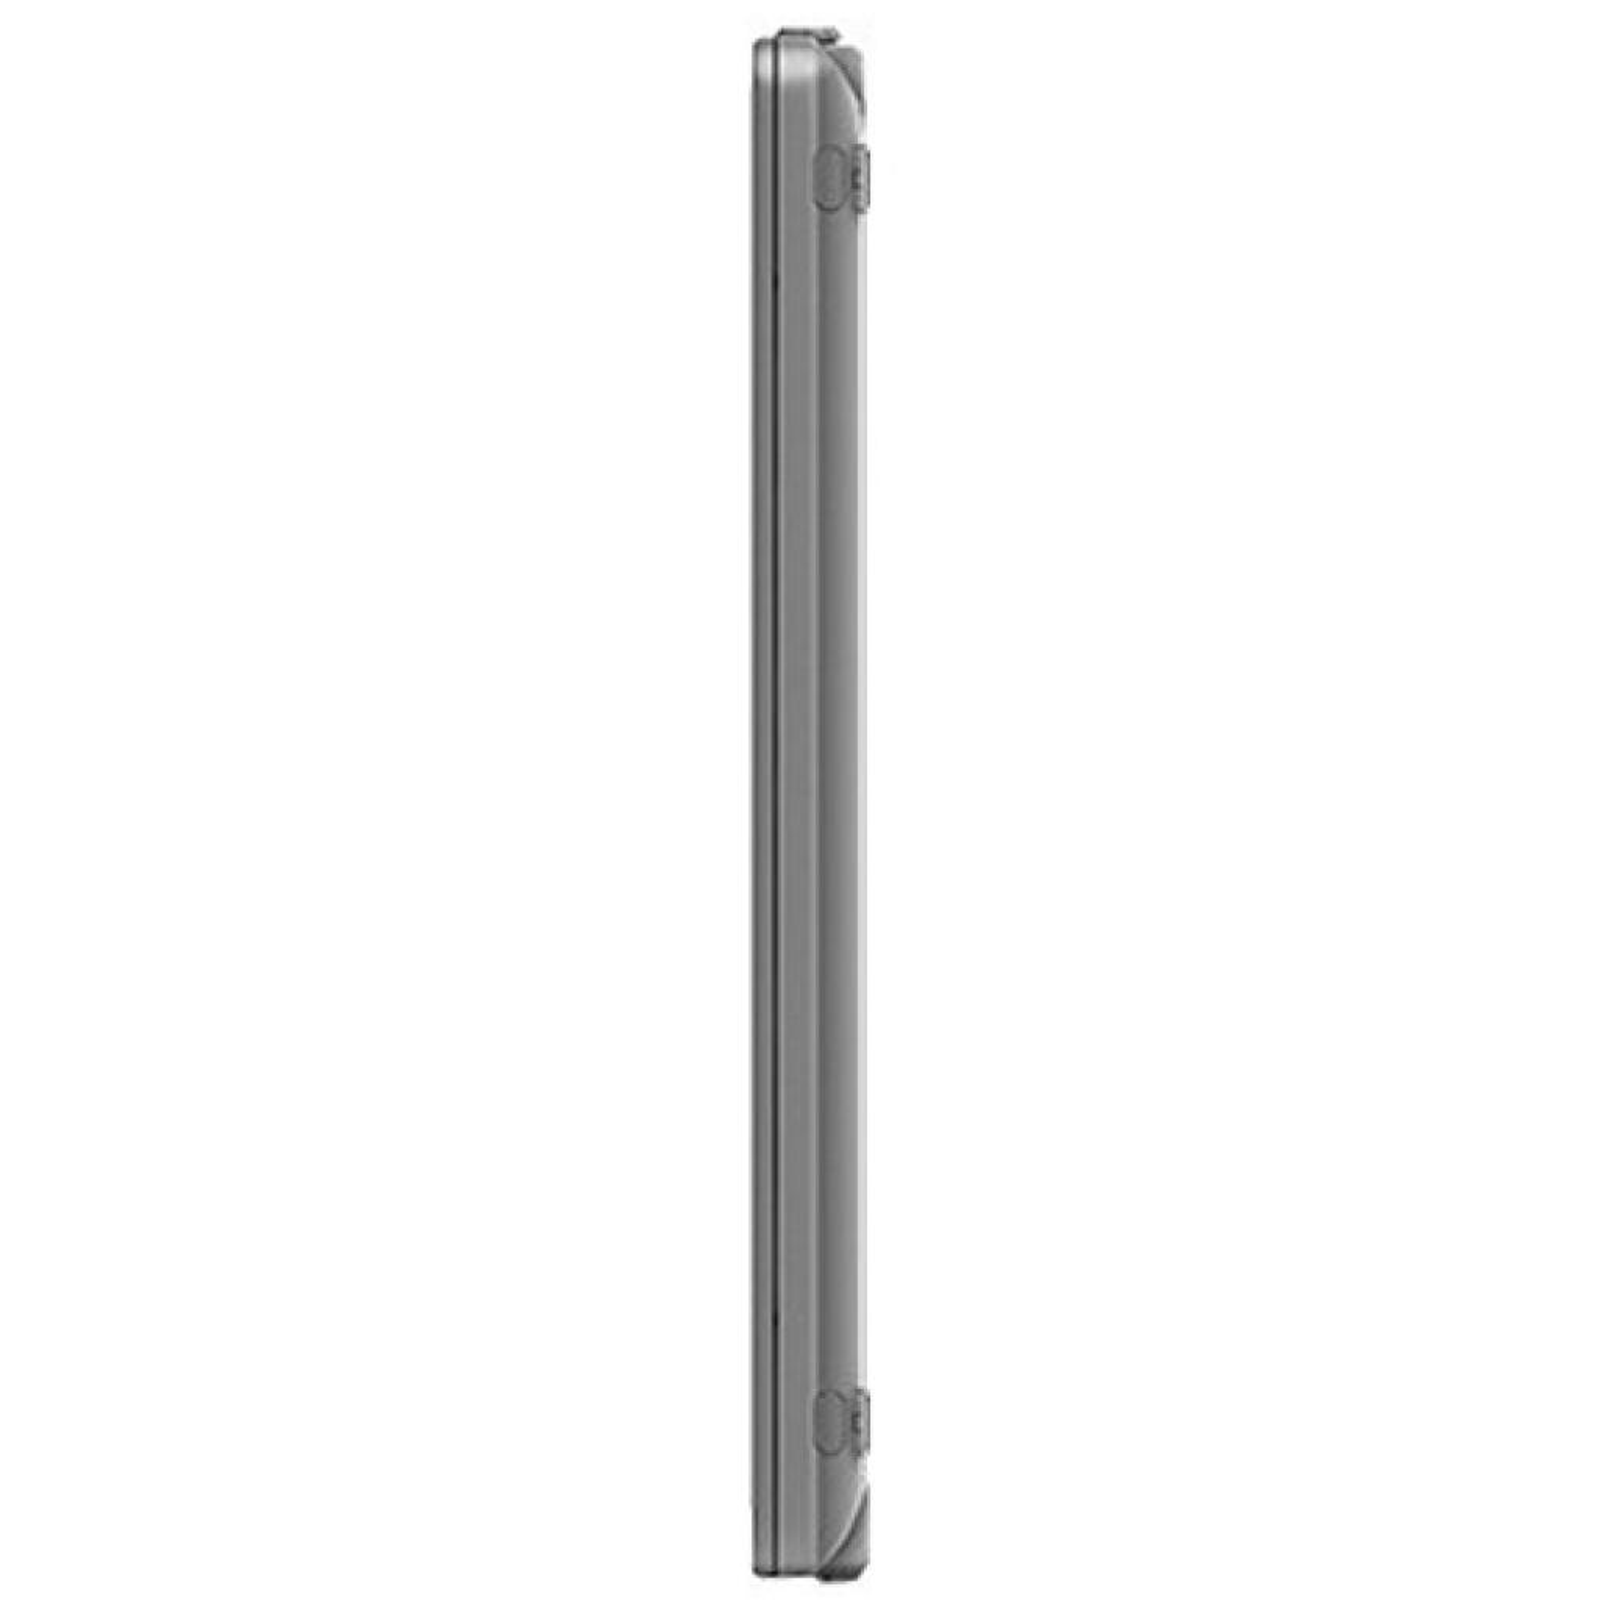 Чехол для планшета Belkin iPad4 LifeProof Case & Cover/Stand (1109-02) изображение 3